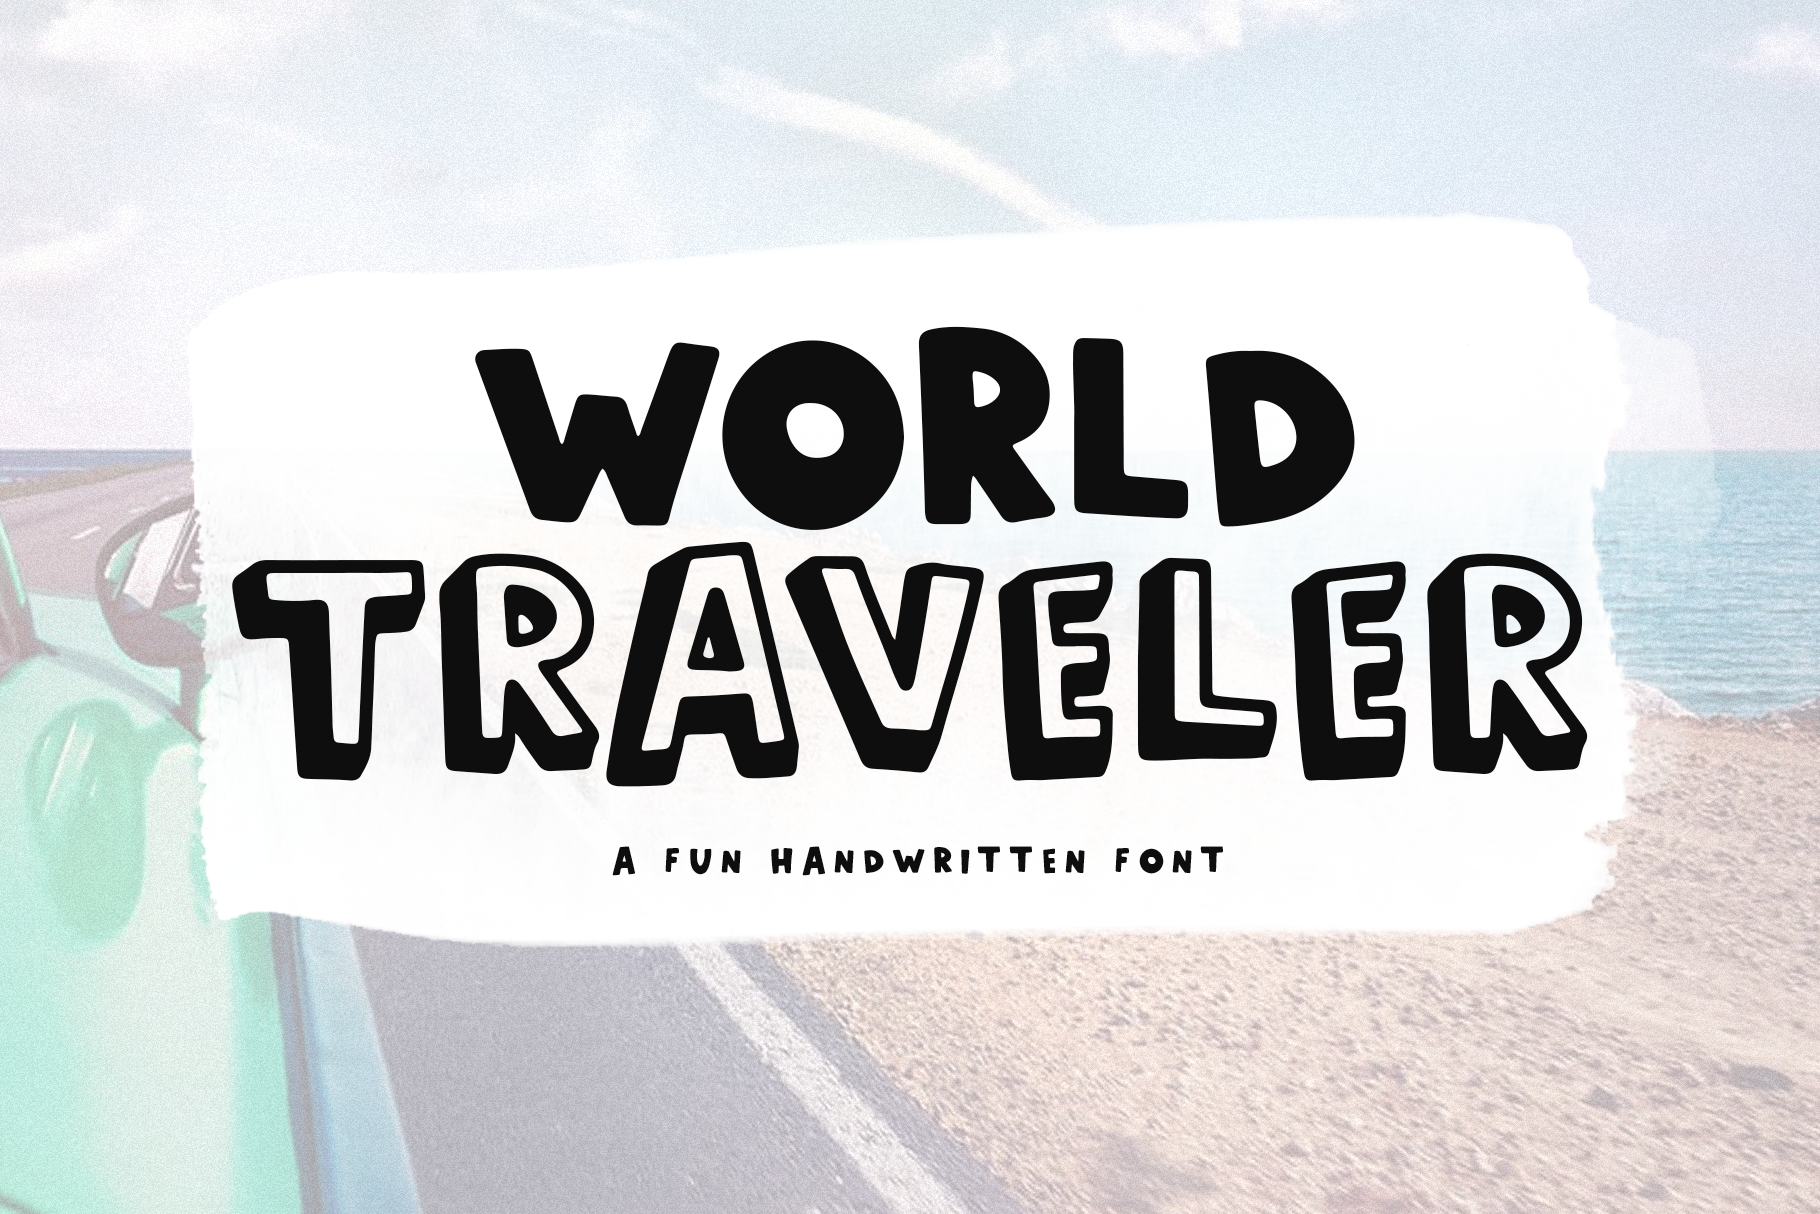 World Traveler - A Quirky Handwritten Font example image 1